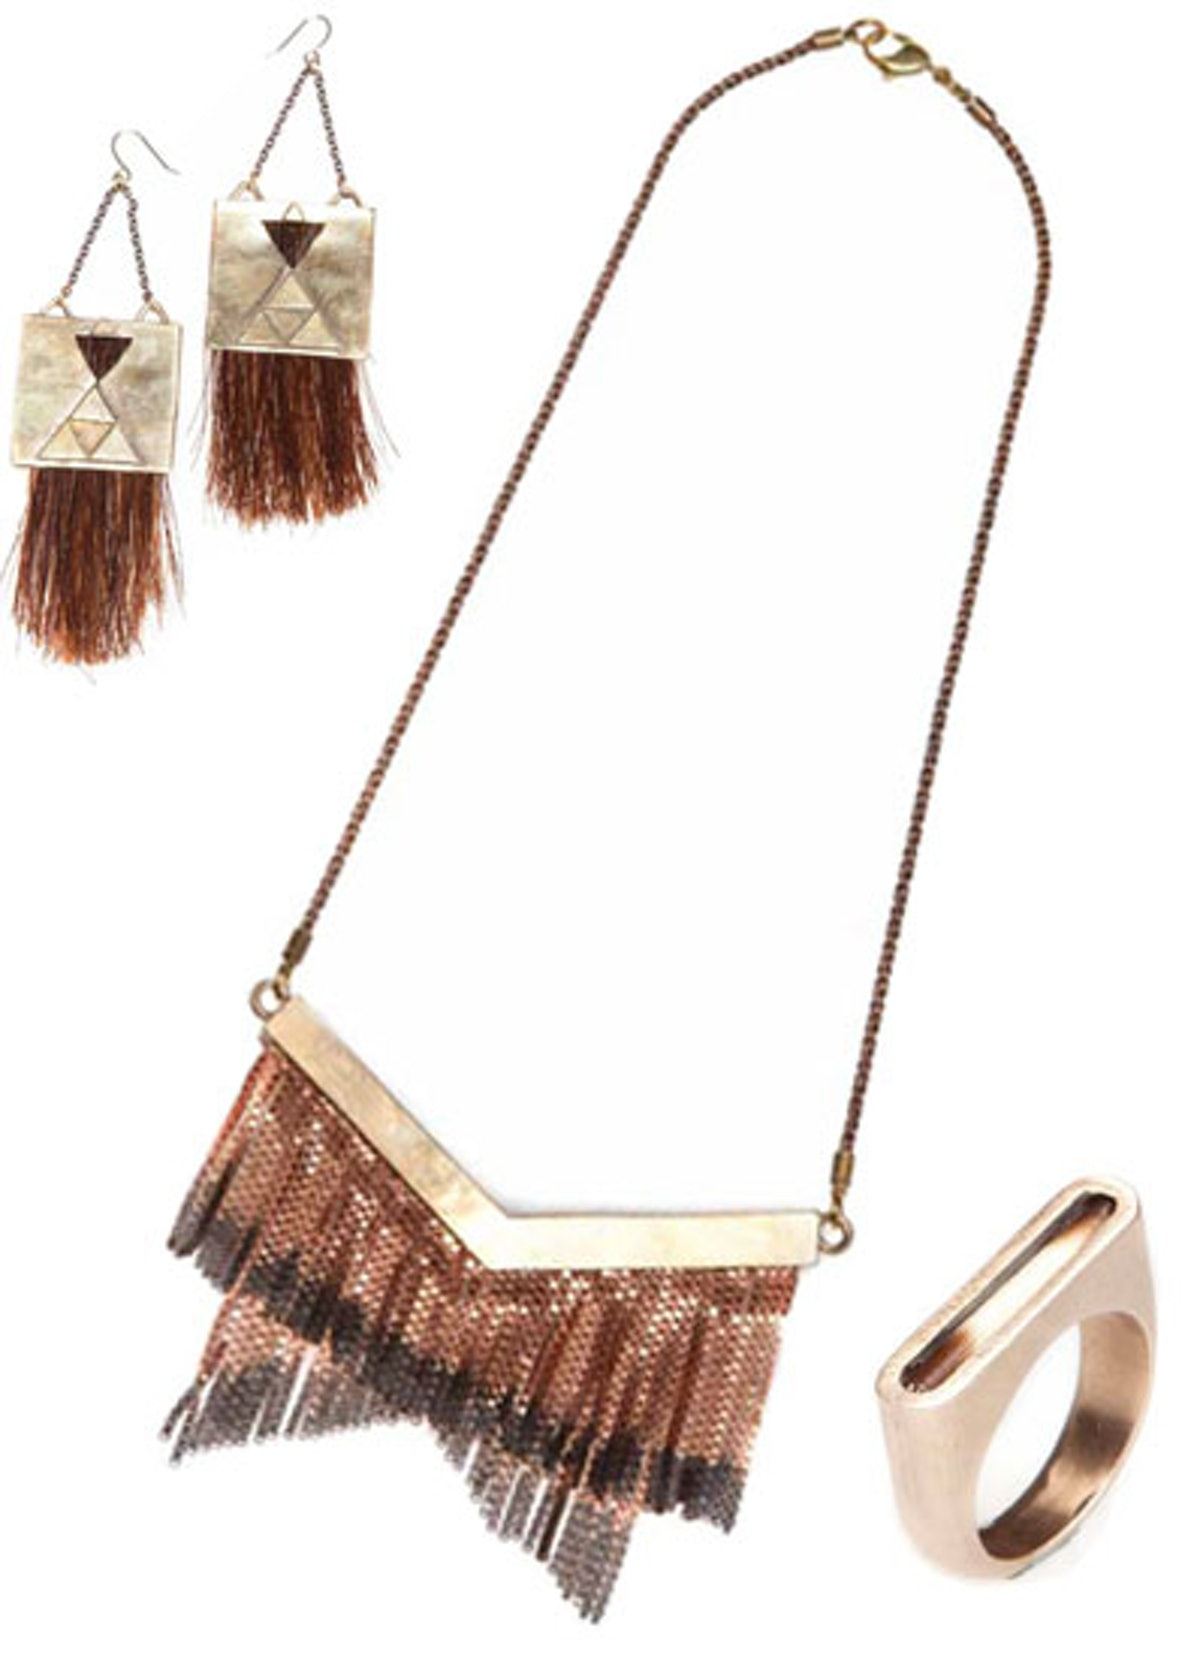 acss-brooklyn-jewelry-06-v.jpg